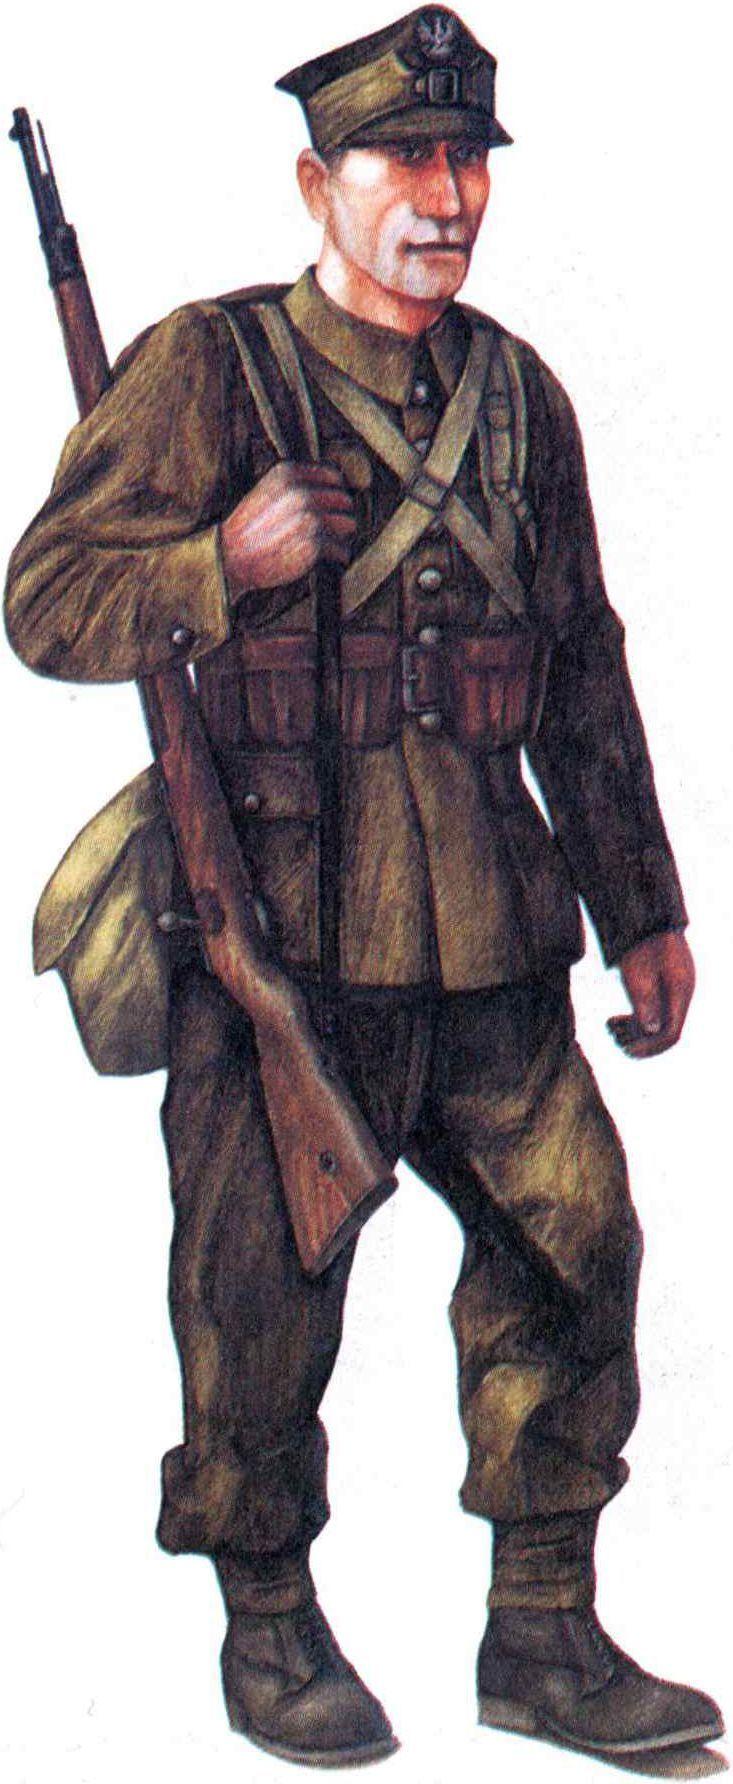 Polish Army infantryman 1939 with 7,92-мм «Mauser»  1898 rifle - pin by Paolo Marzioli